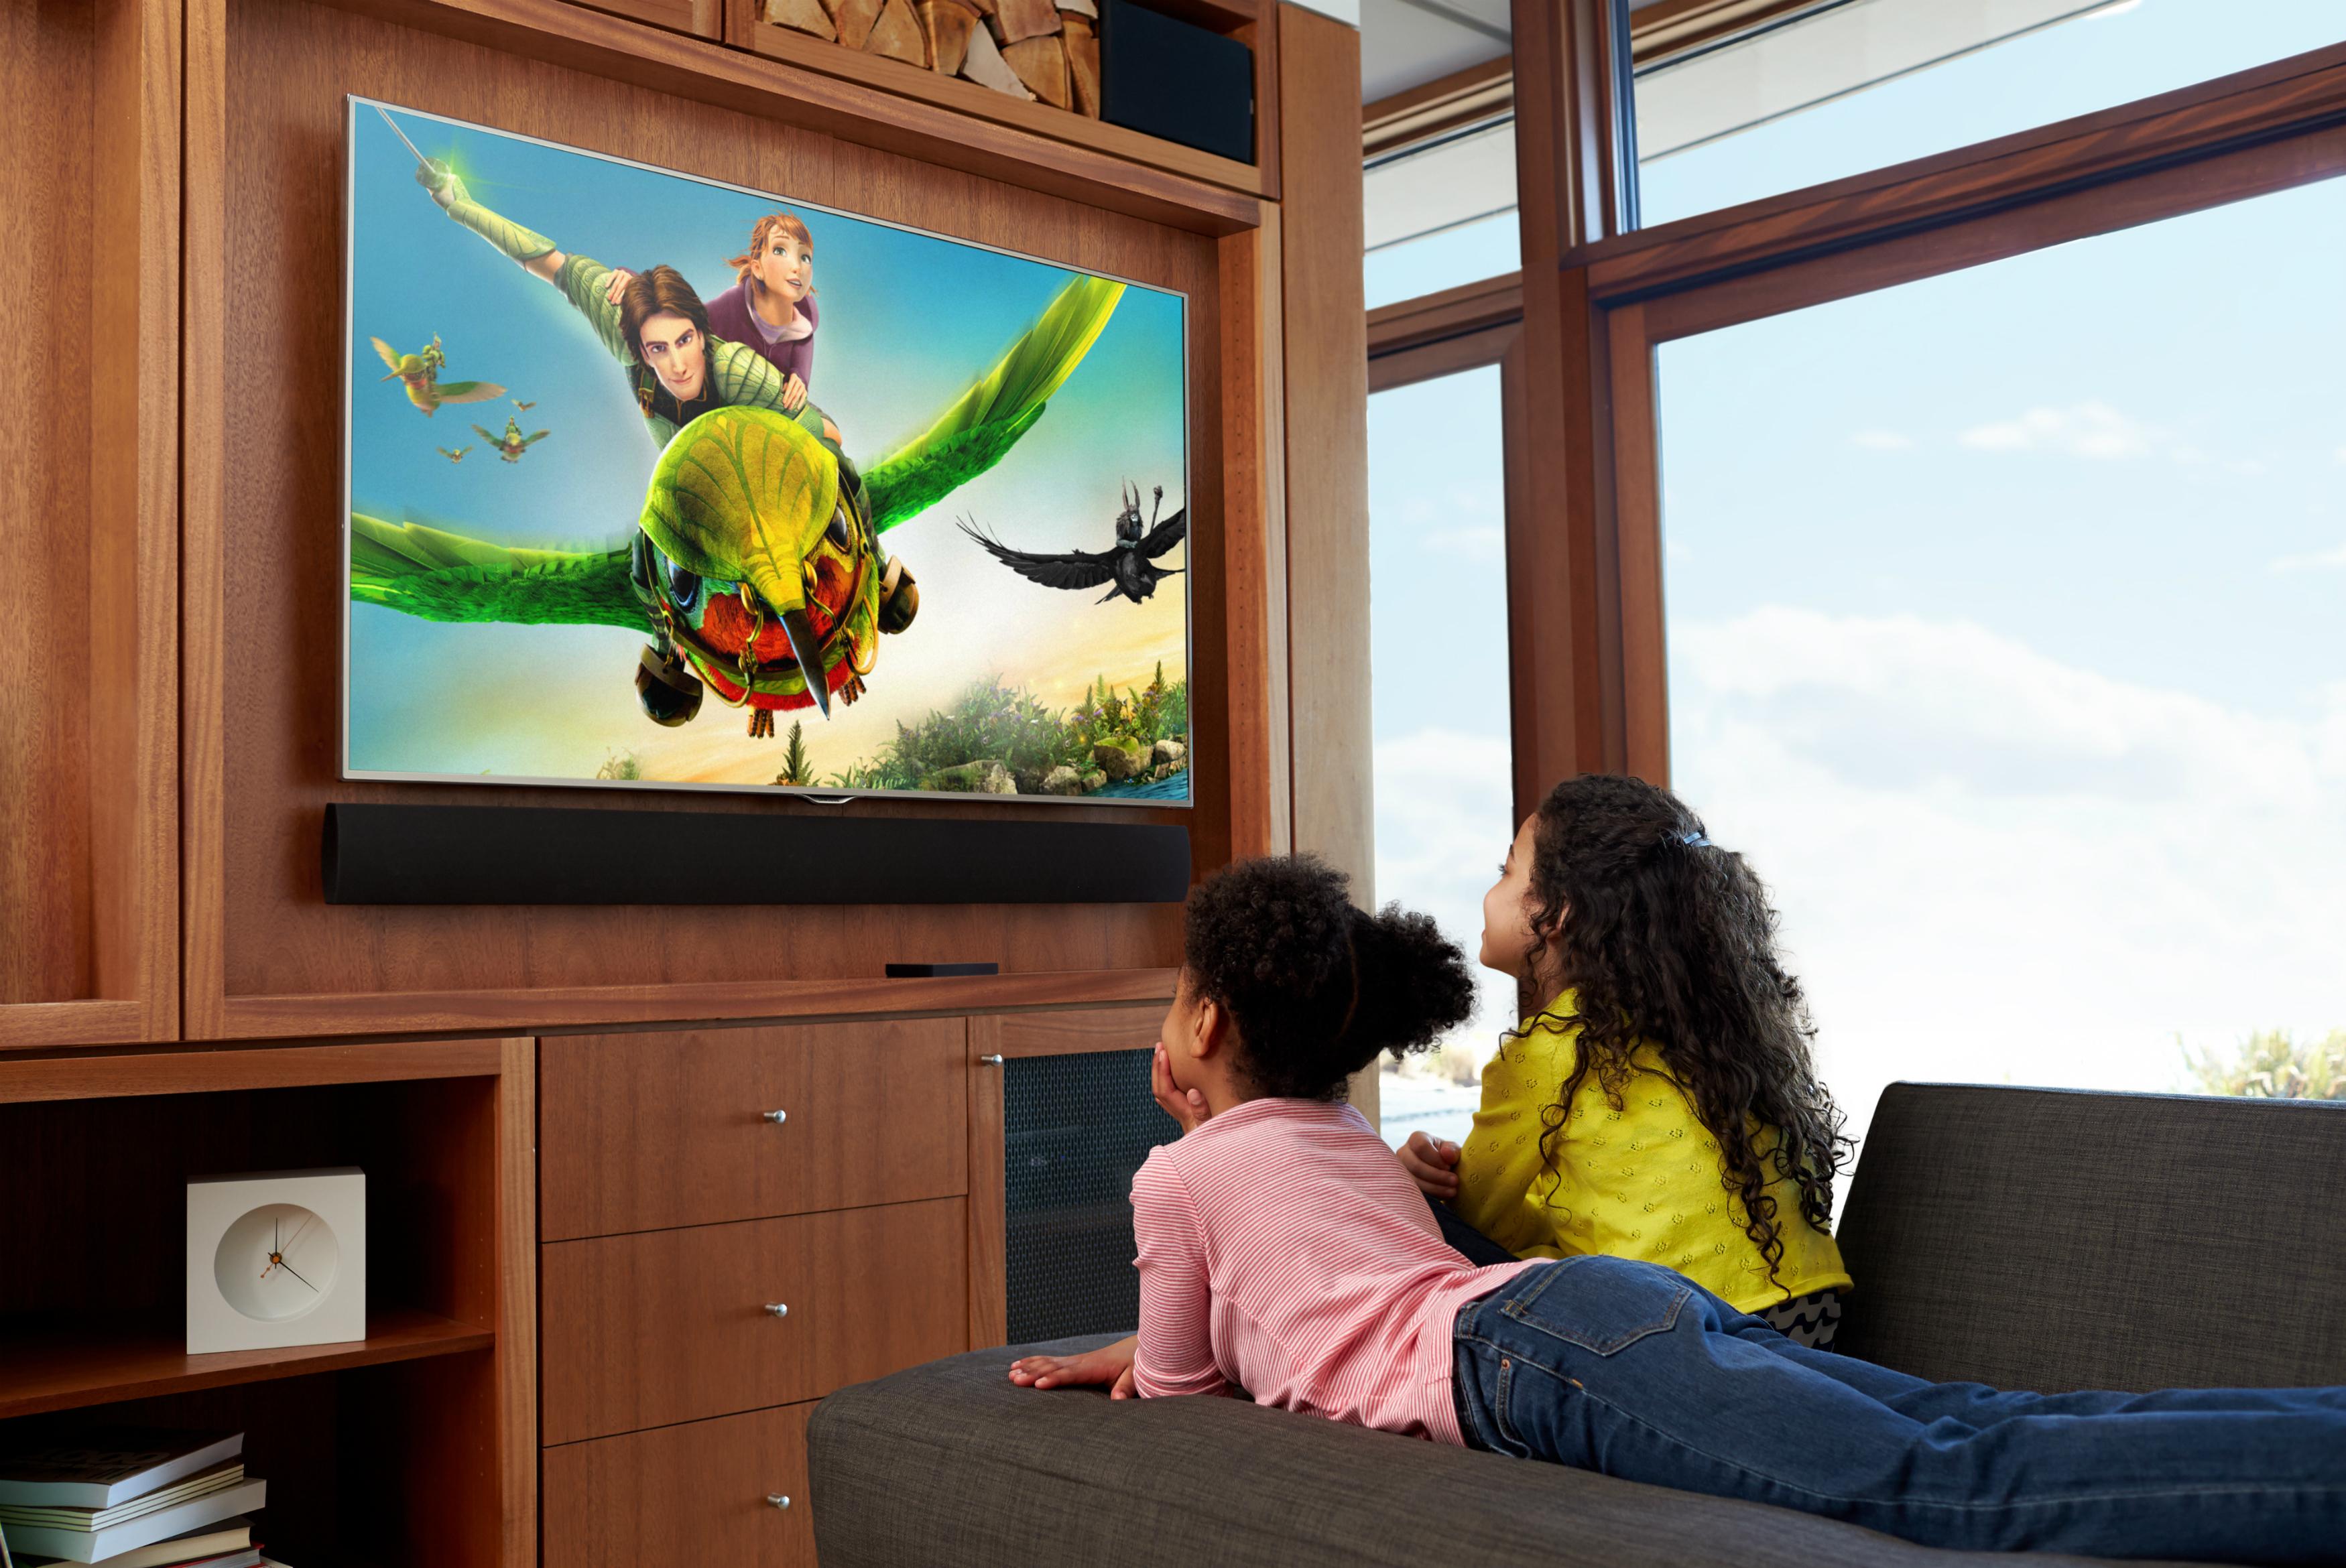 Smart TVs